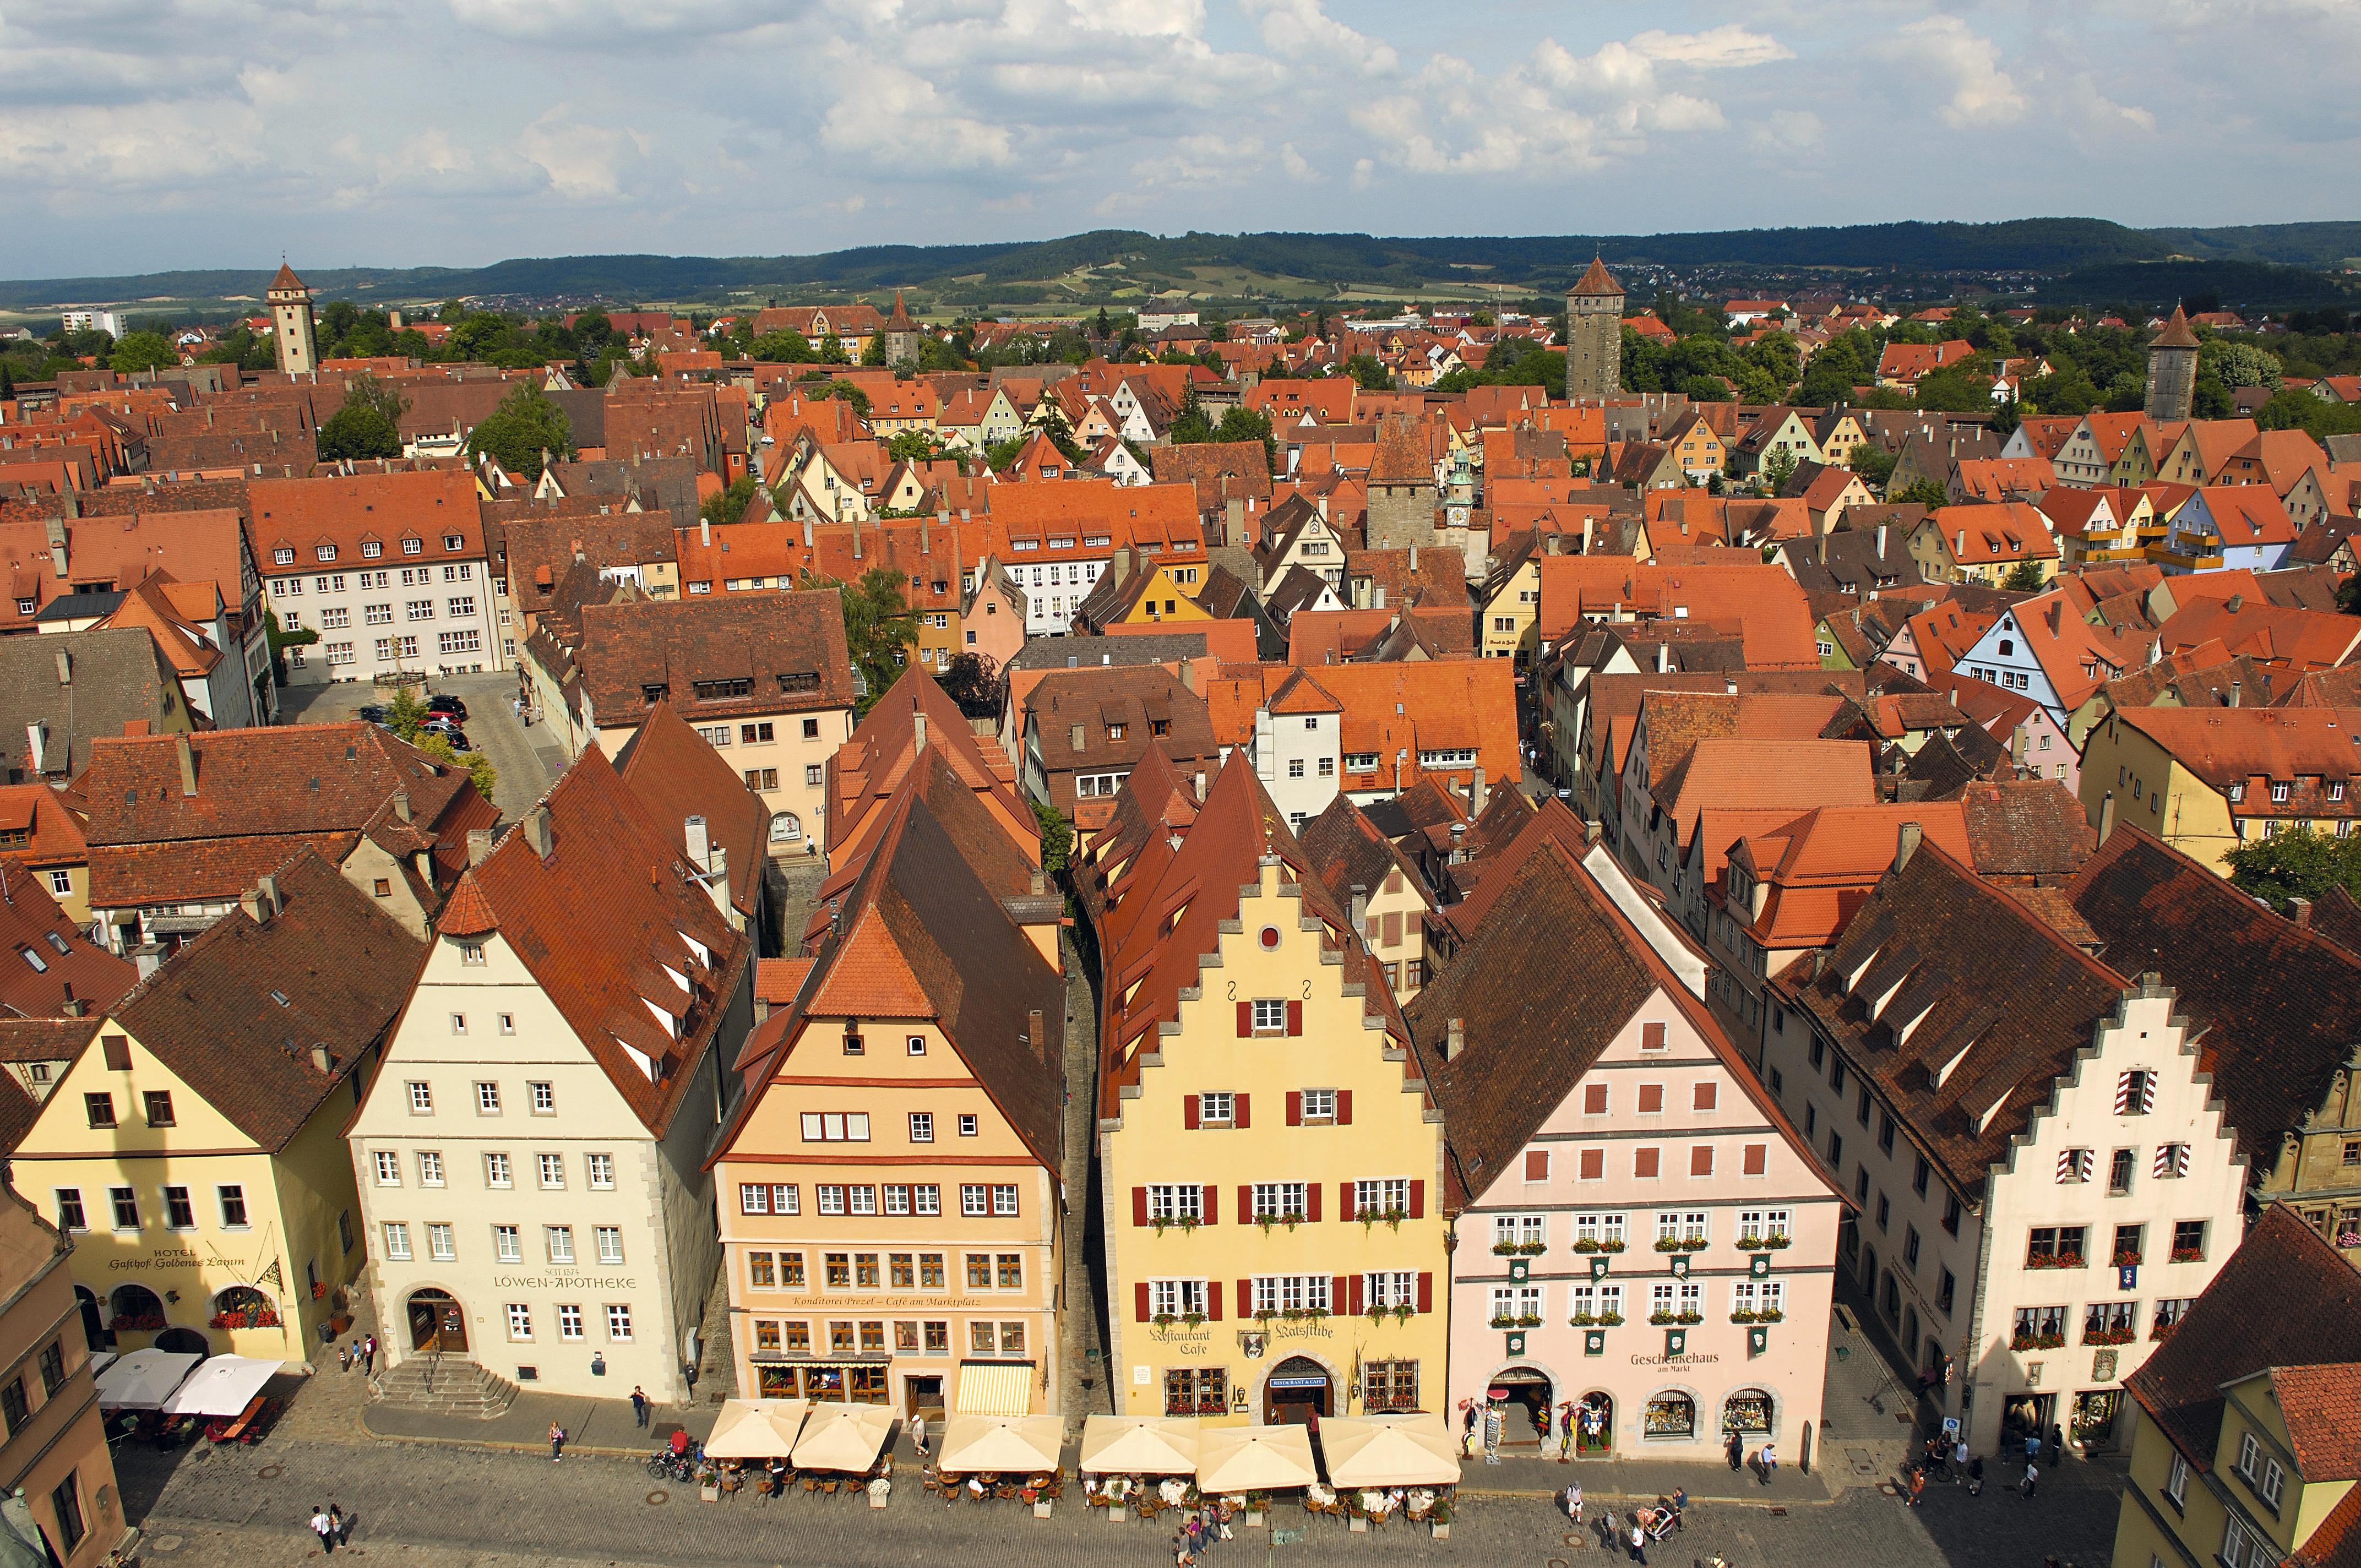 Vista de Rothenburg ob der Tauber, Alemanha